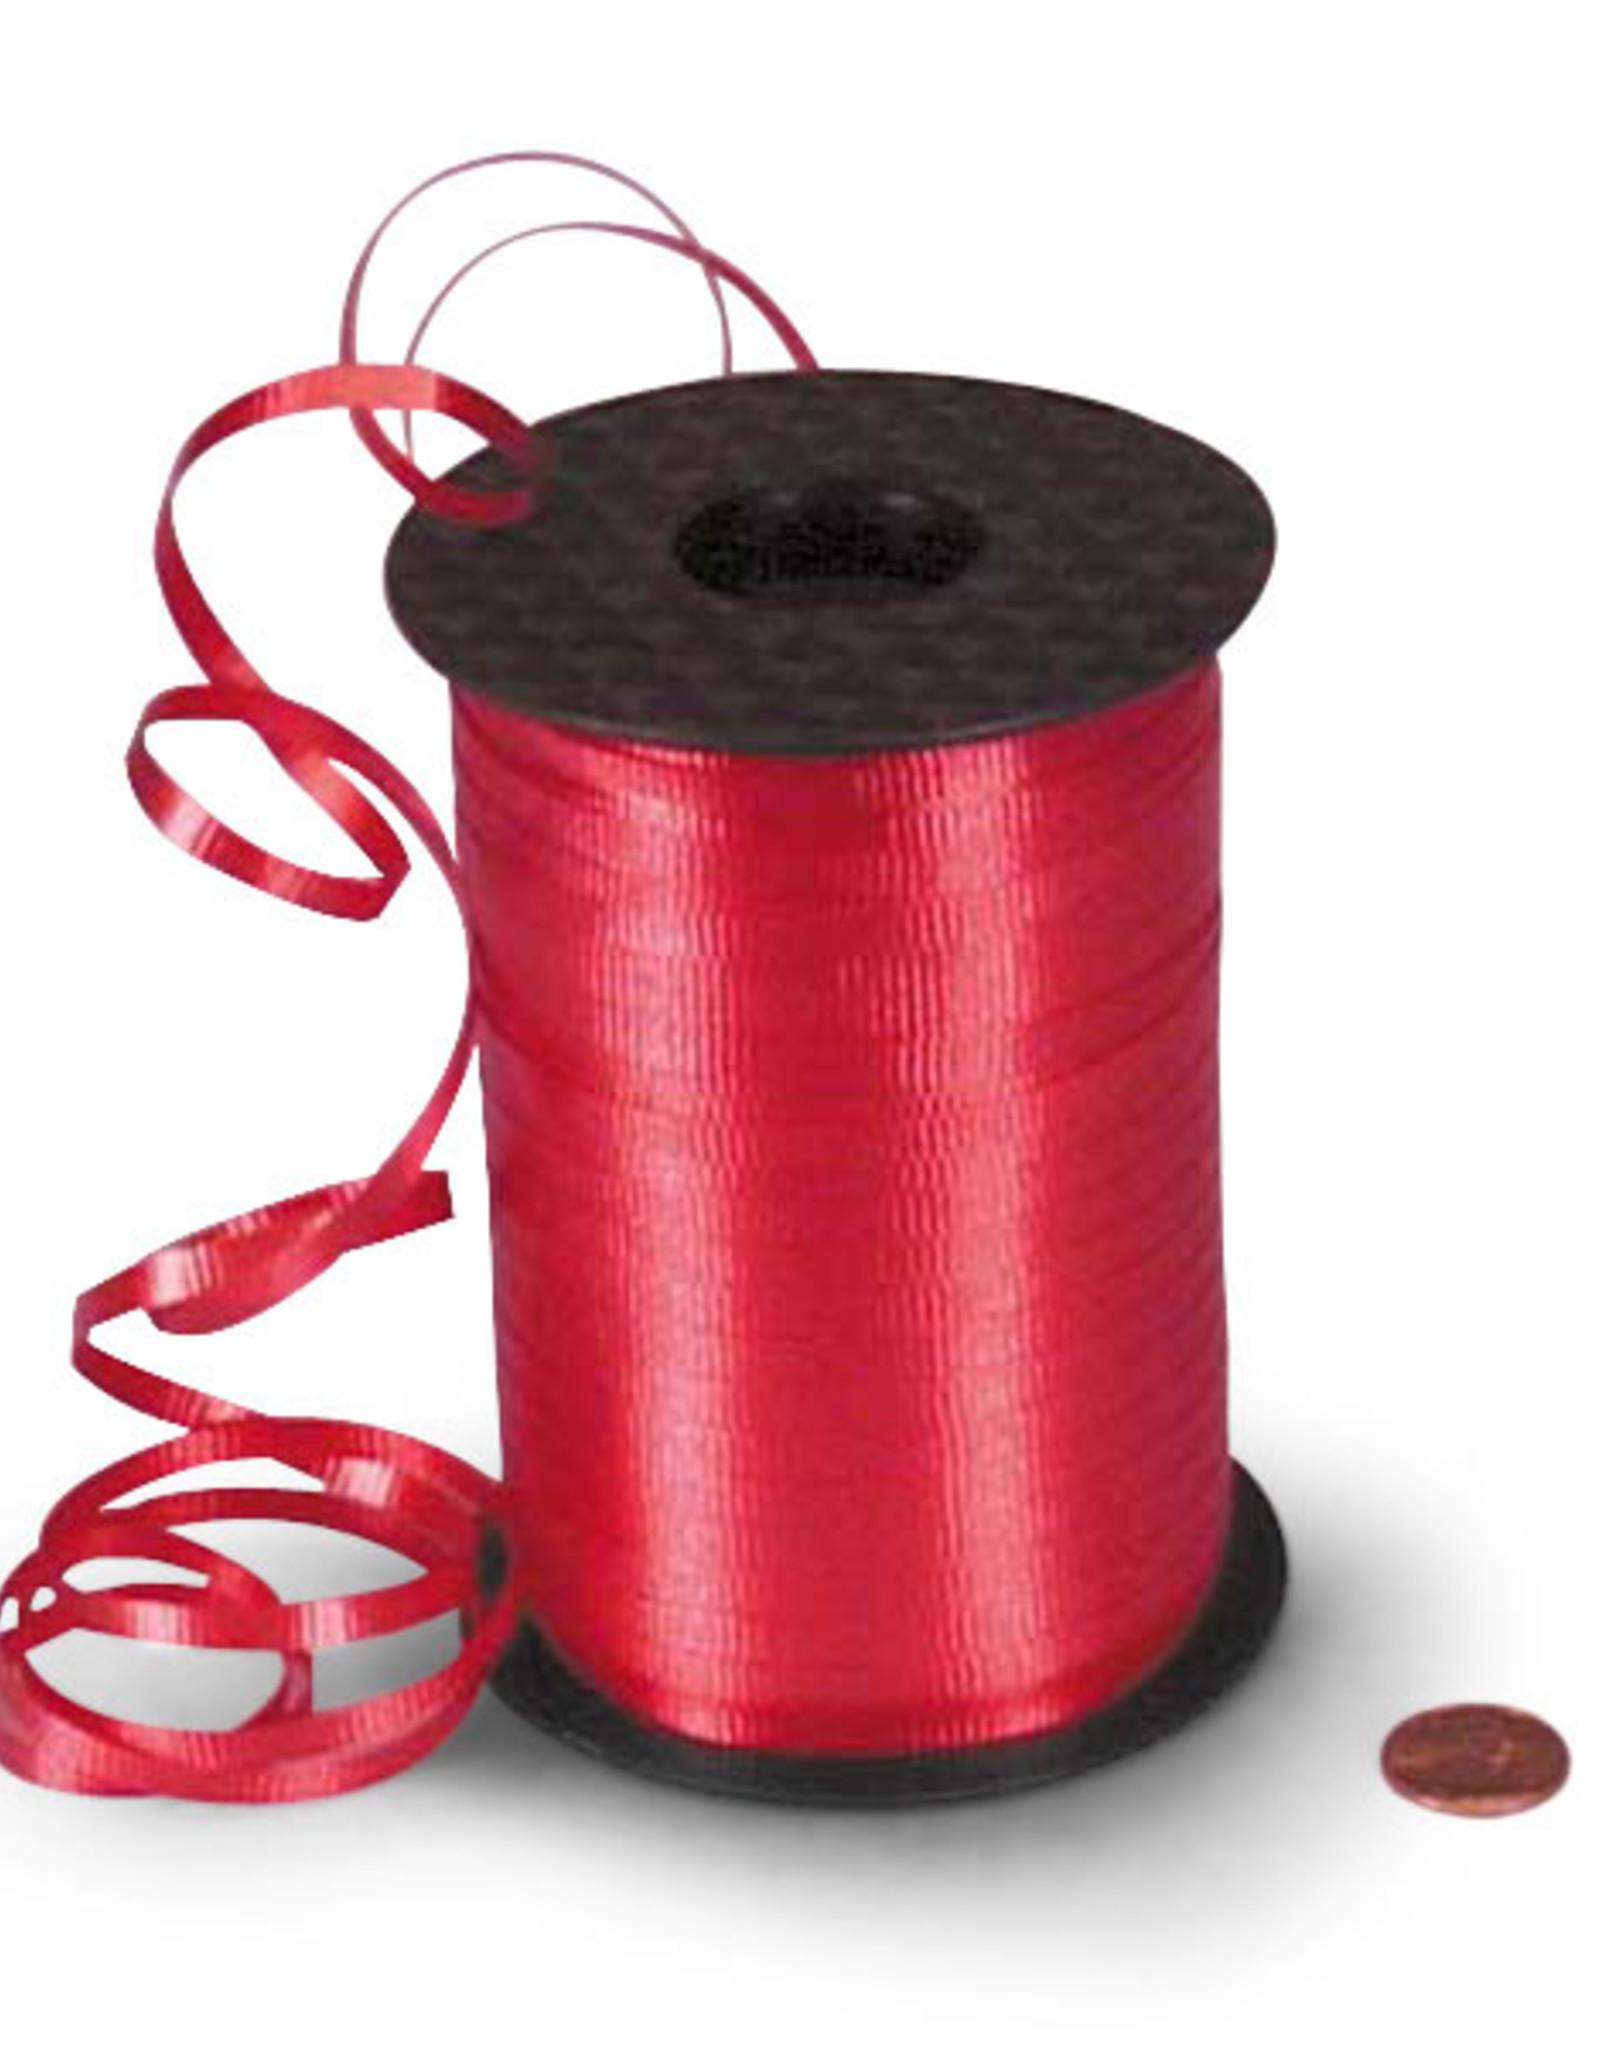 Berwick Crimped Curling Ribbon 3/16 x 500 yds